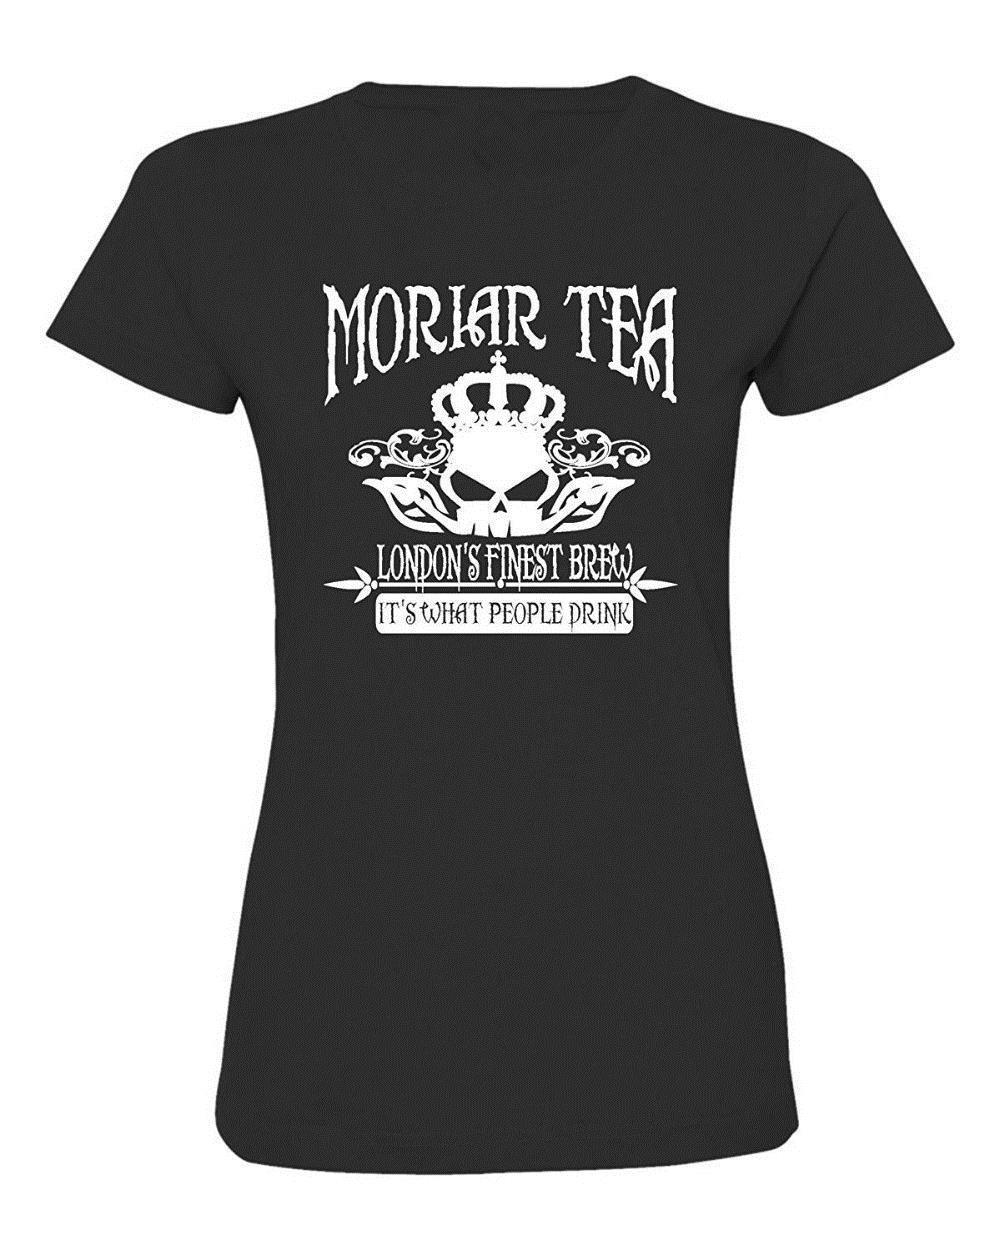 5af662a54 Business Shirts Crew Neck Moriar Tea Funny Professor Moriarty Deluxe Soft  Comfort Soft Short Sleeve Shirt For Women The Coolest T Shirts T Shirt Shirt  ...